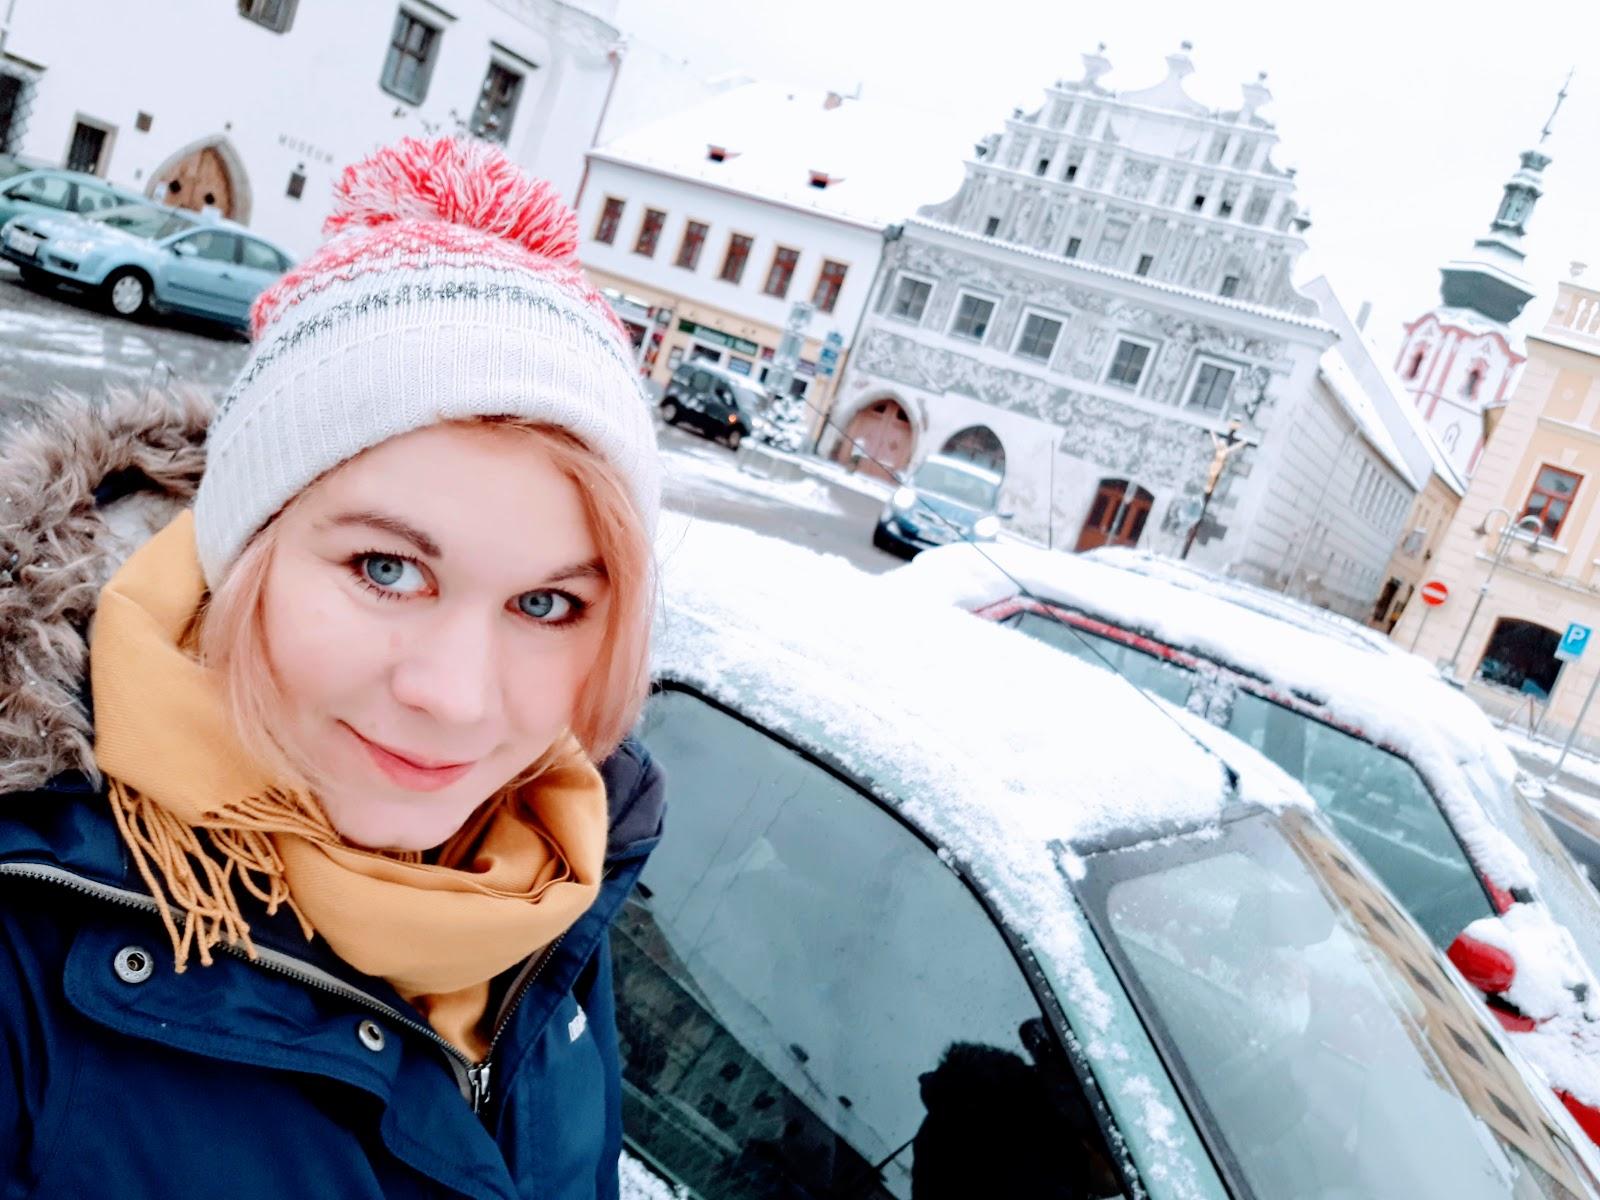 Veronika Opatrilova